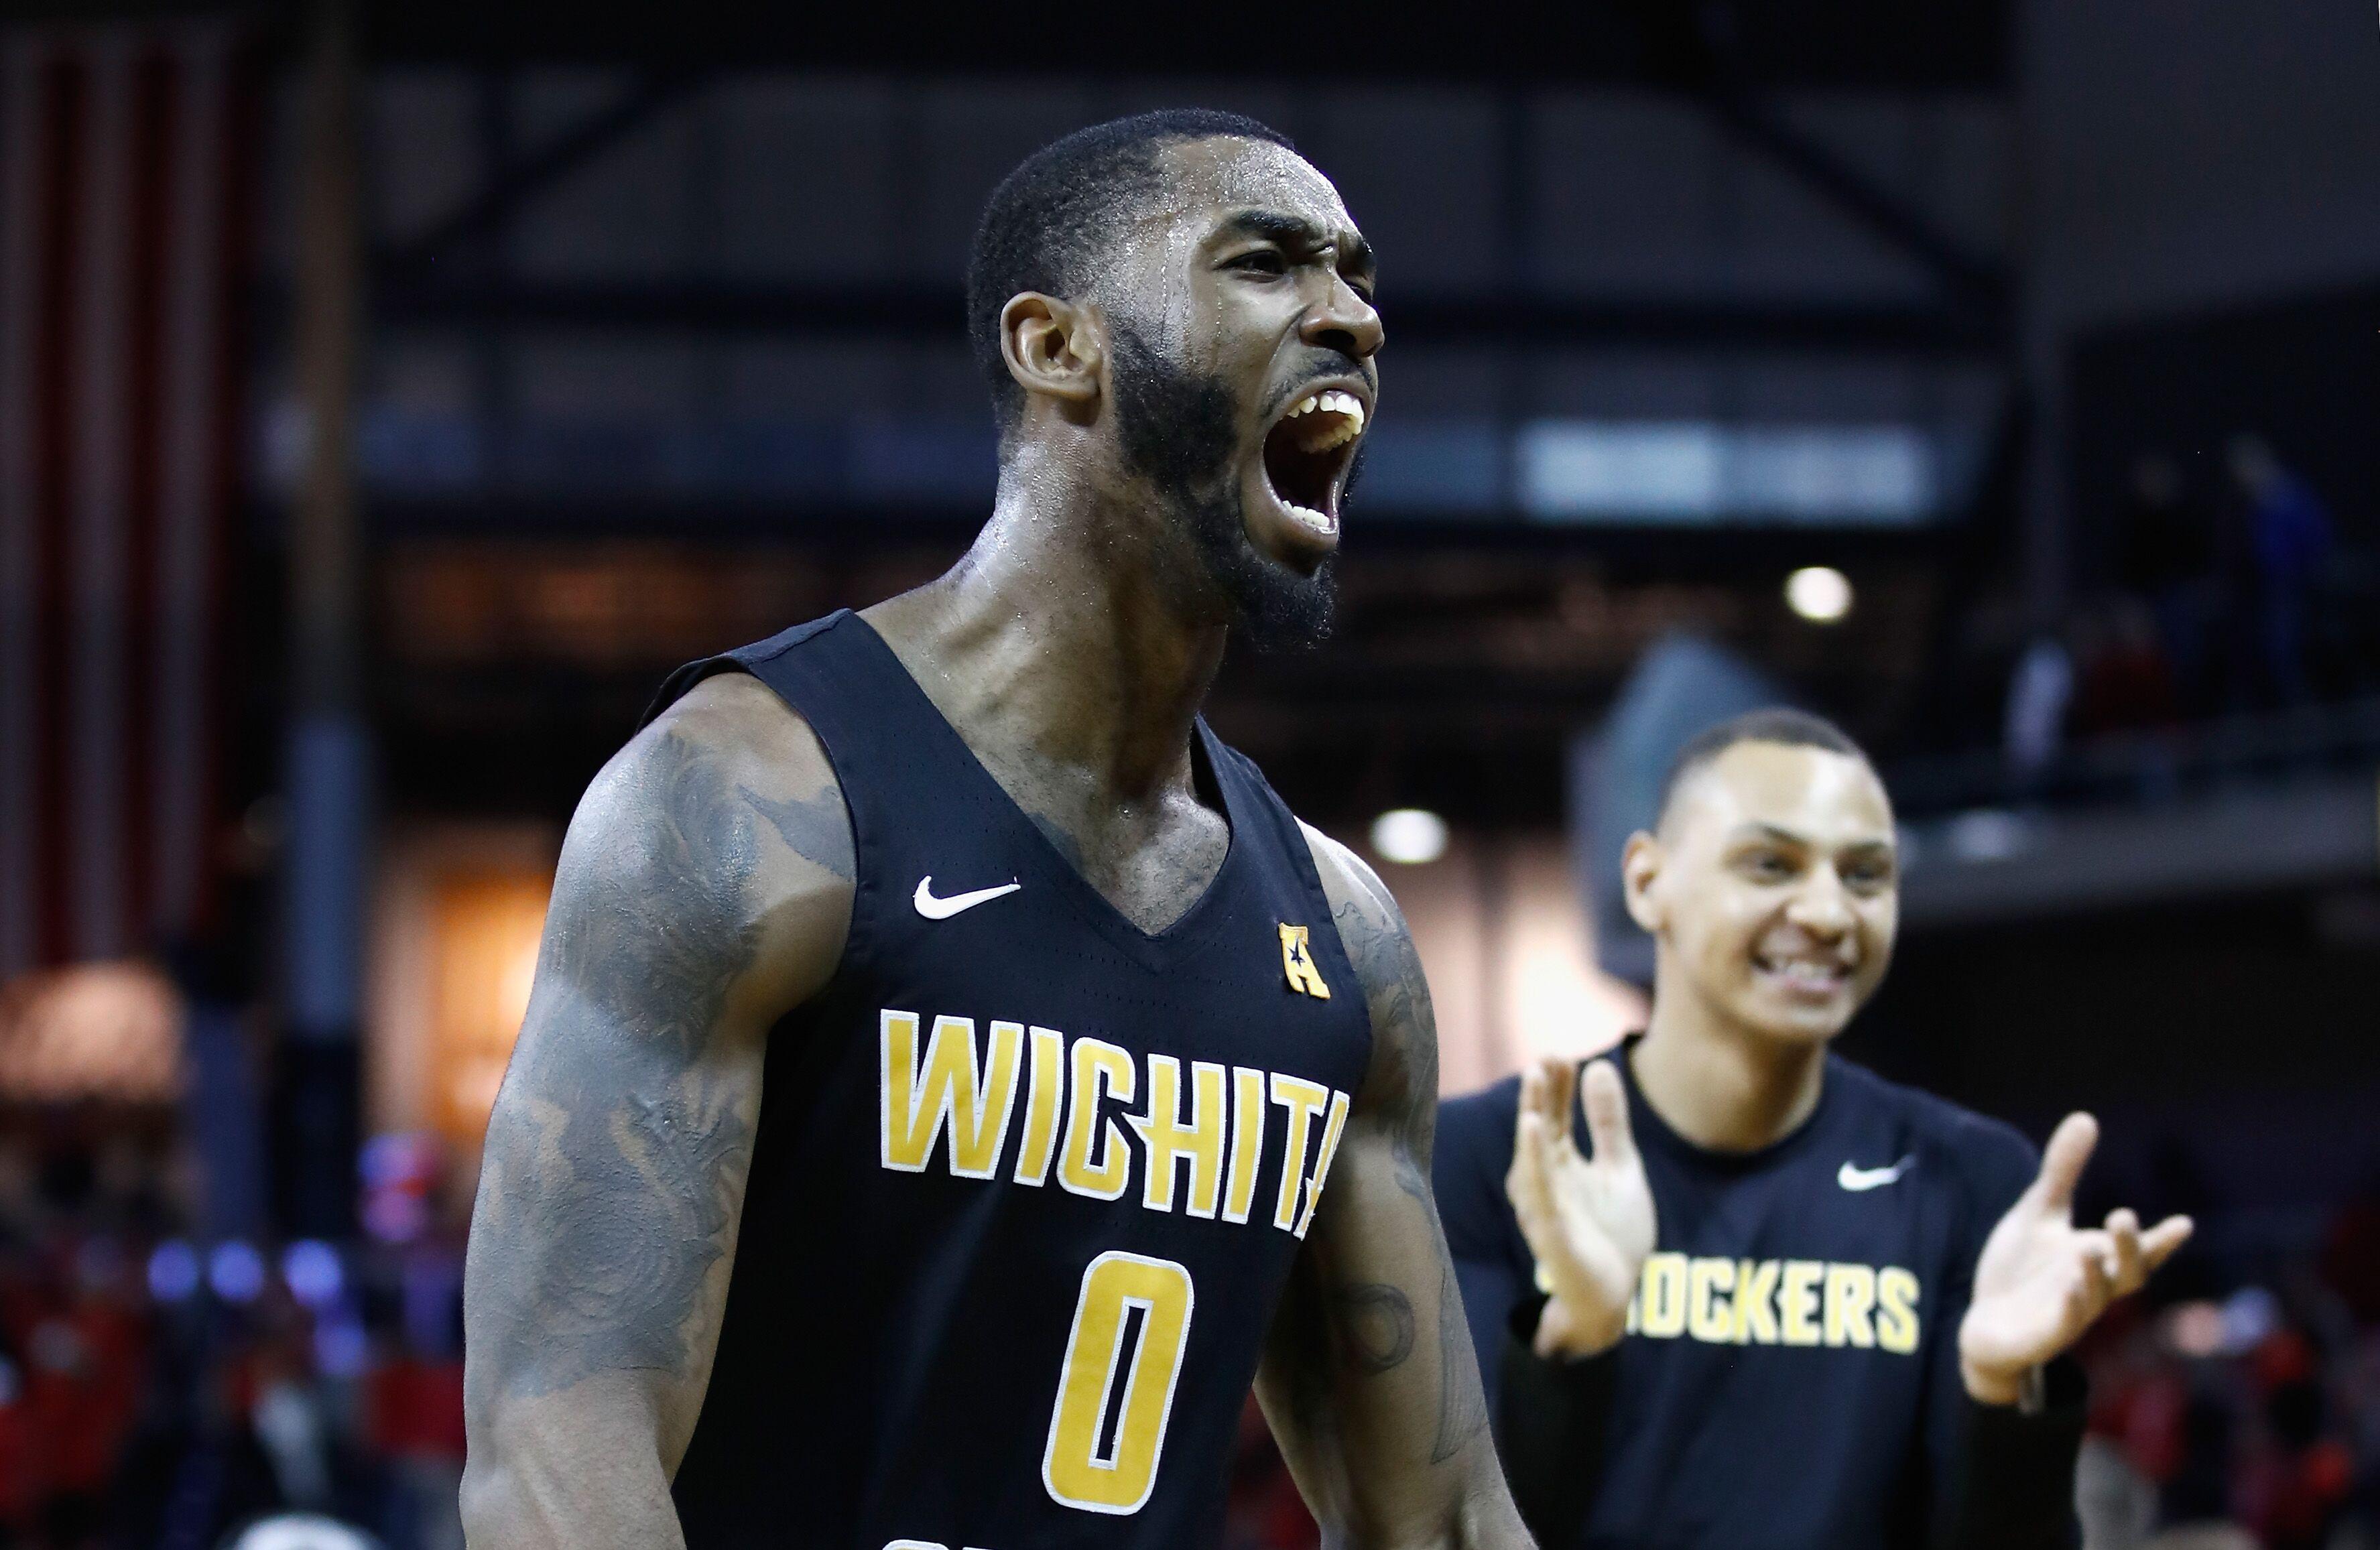 Ncaa Bracketology Kentucky Is No 1 Seed Uc Bearcats No: College Basketball Bracketology 2018: February 19